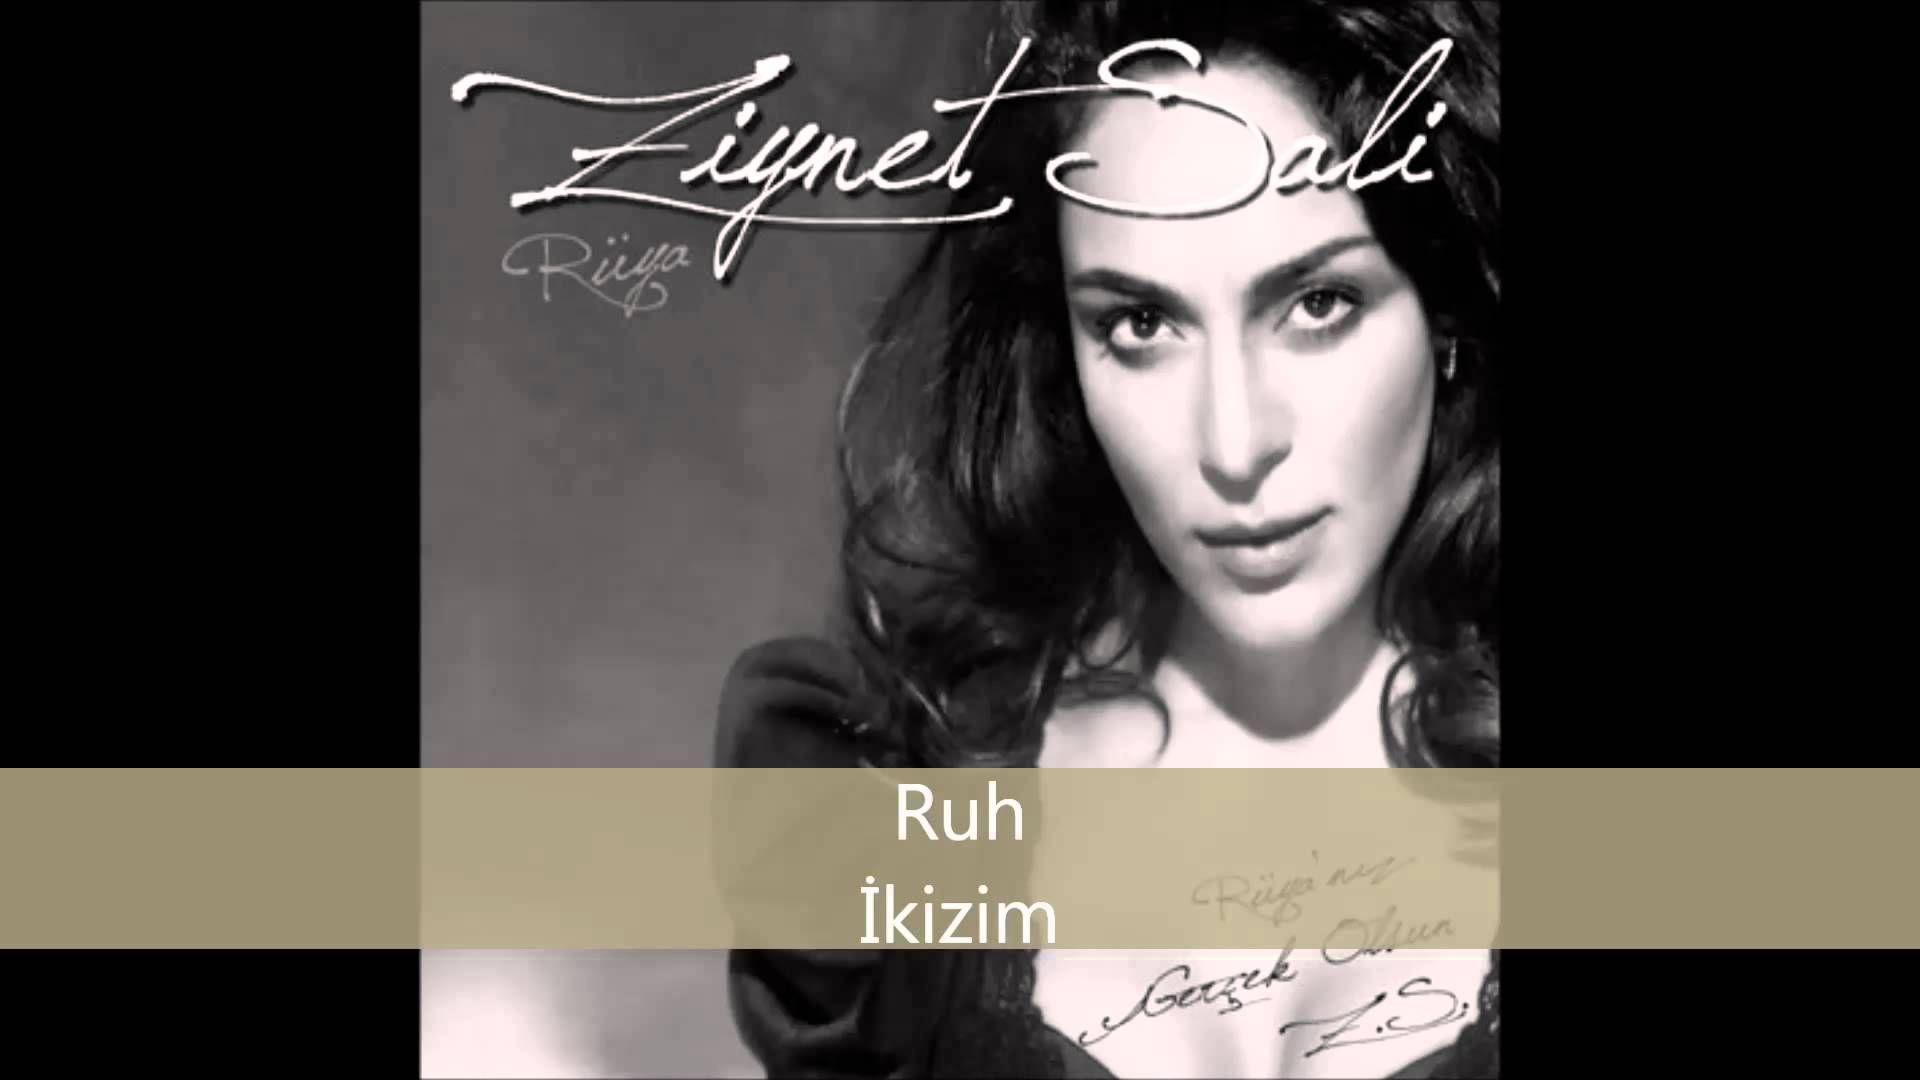 Ziynet Sali Ruh Ikizim 2014 Youtube Music Videos Movie Posters Poster